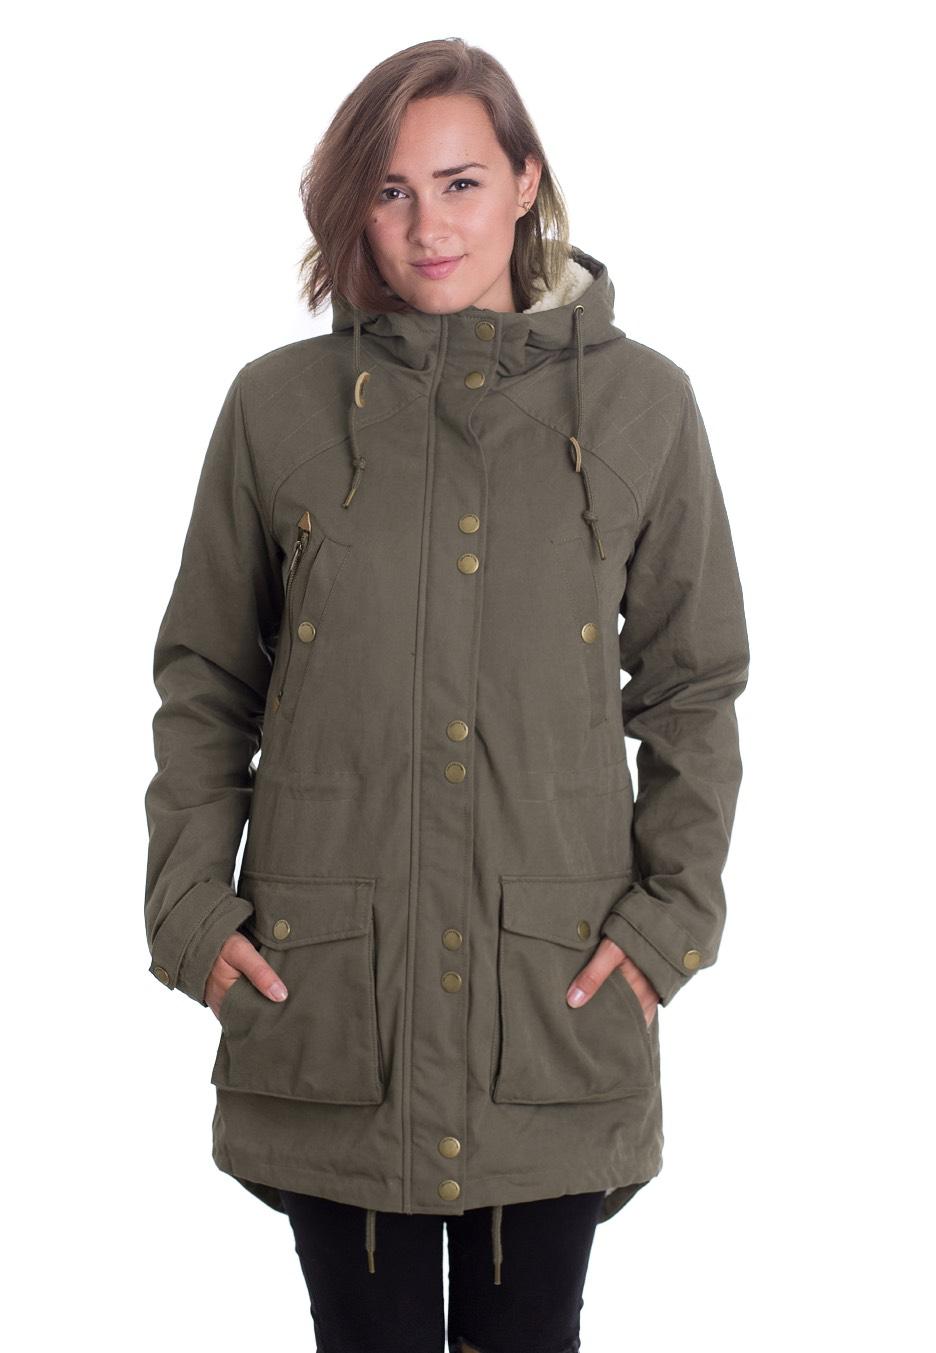 Volcom Walk On By Parka Jacket women (dark camo) buy at